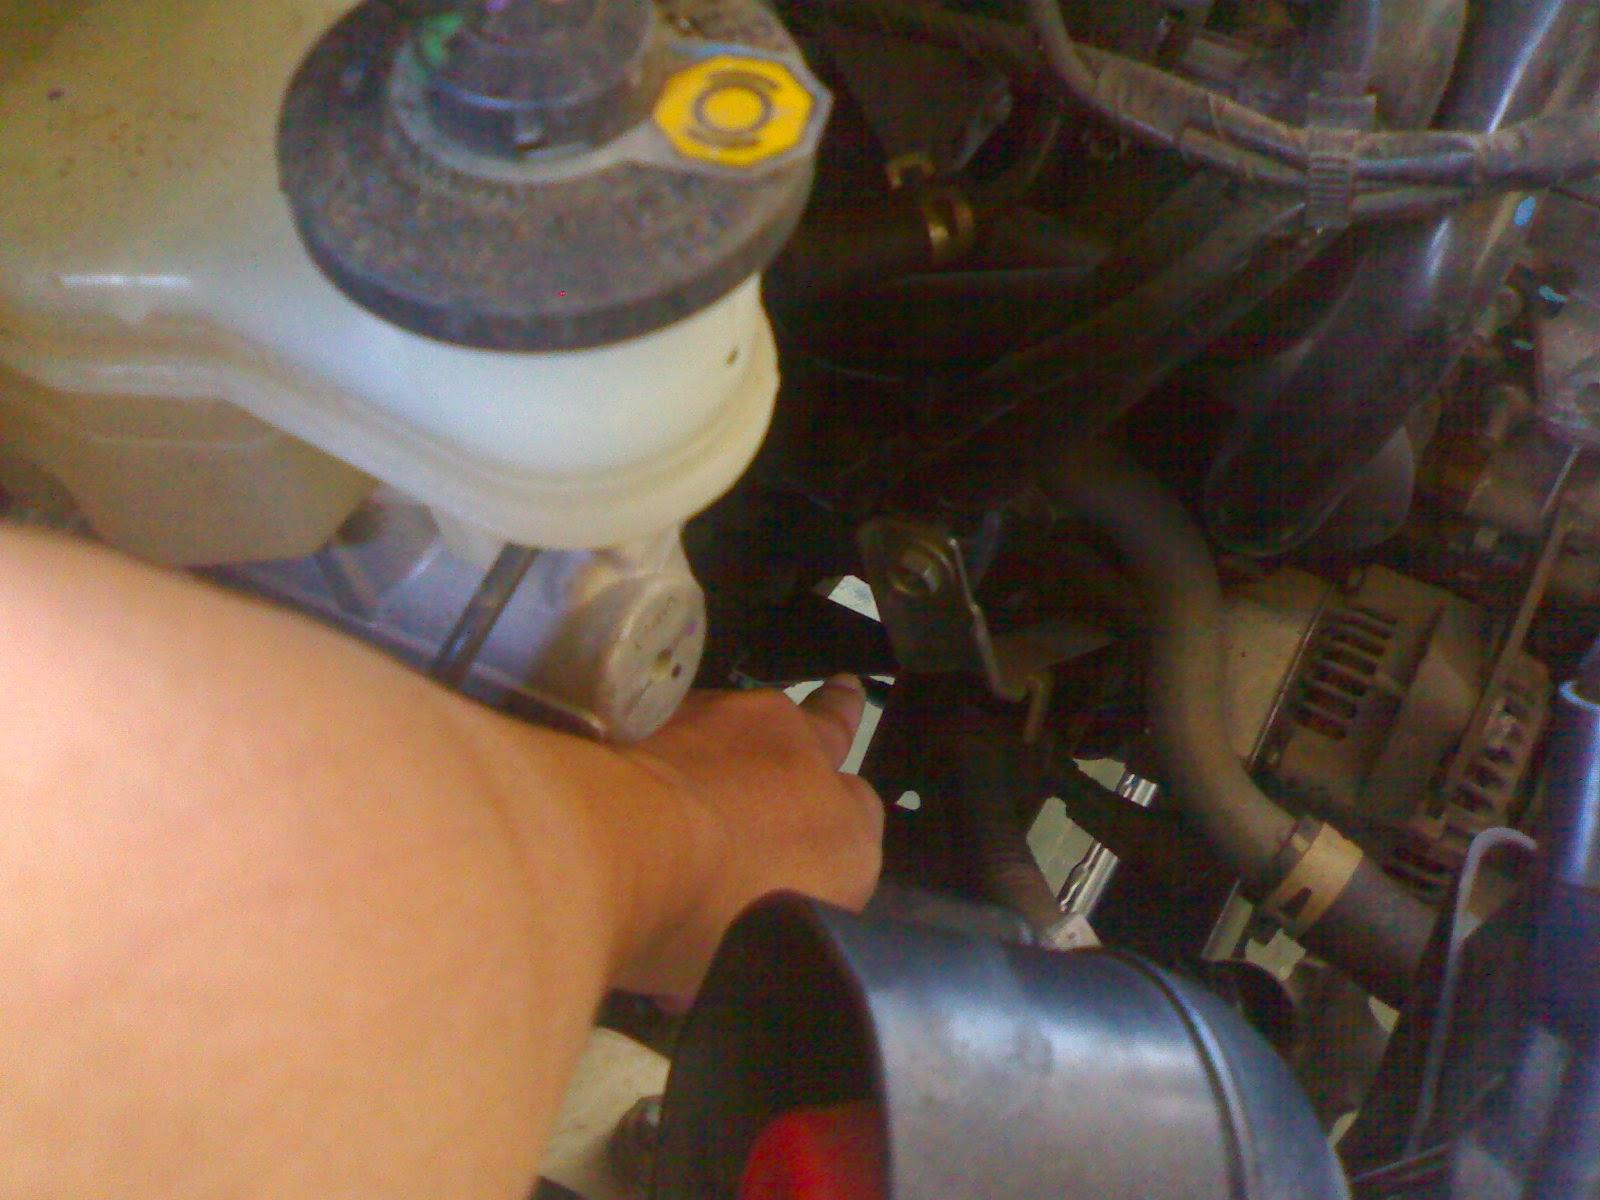 cara menyetel kopling grand new avanza lampu indikator setel xenia tanpa ngolong ujung kabel masuk ke bagian mesin ketinggian